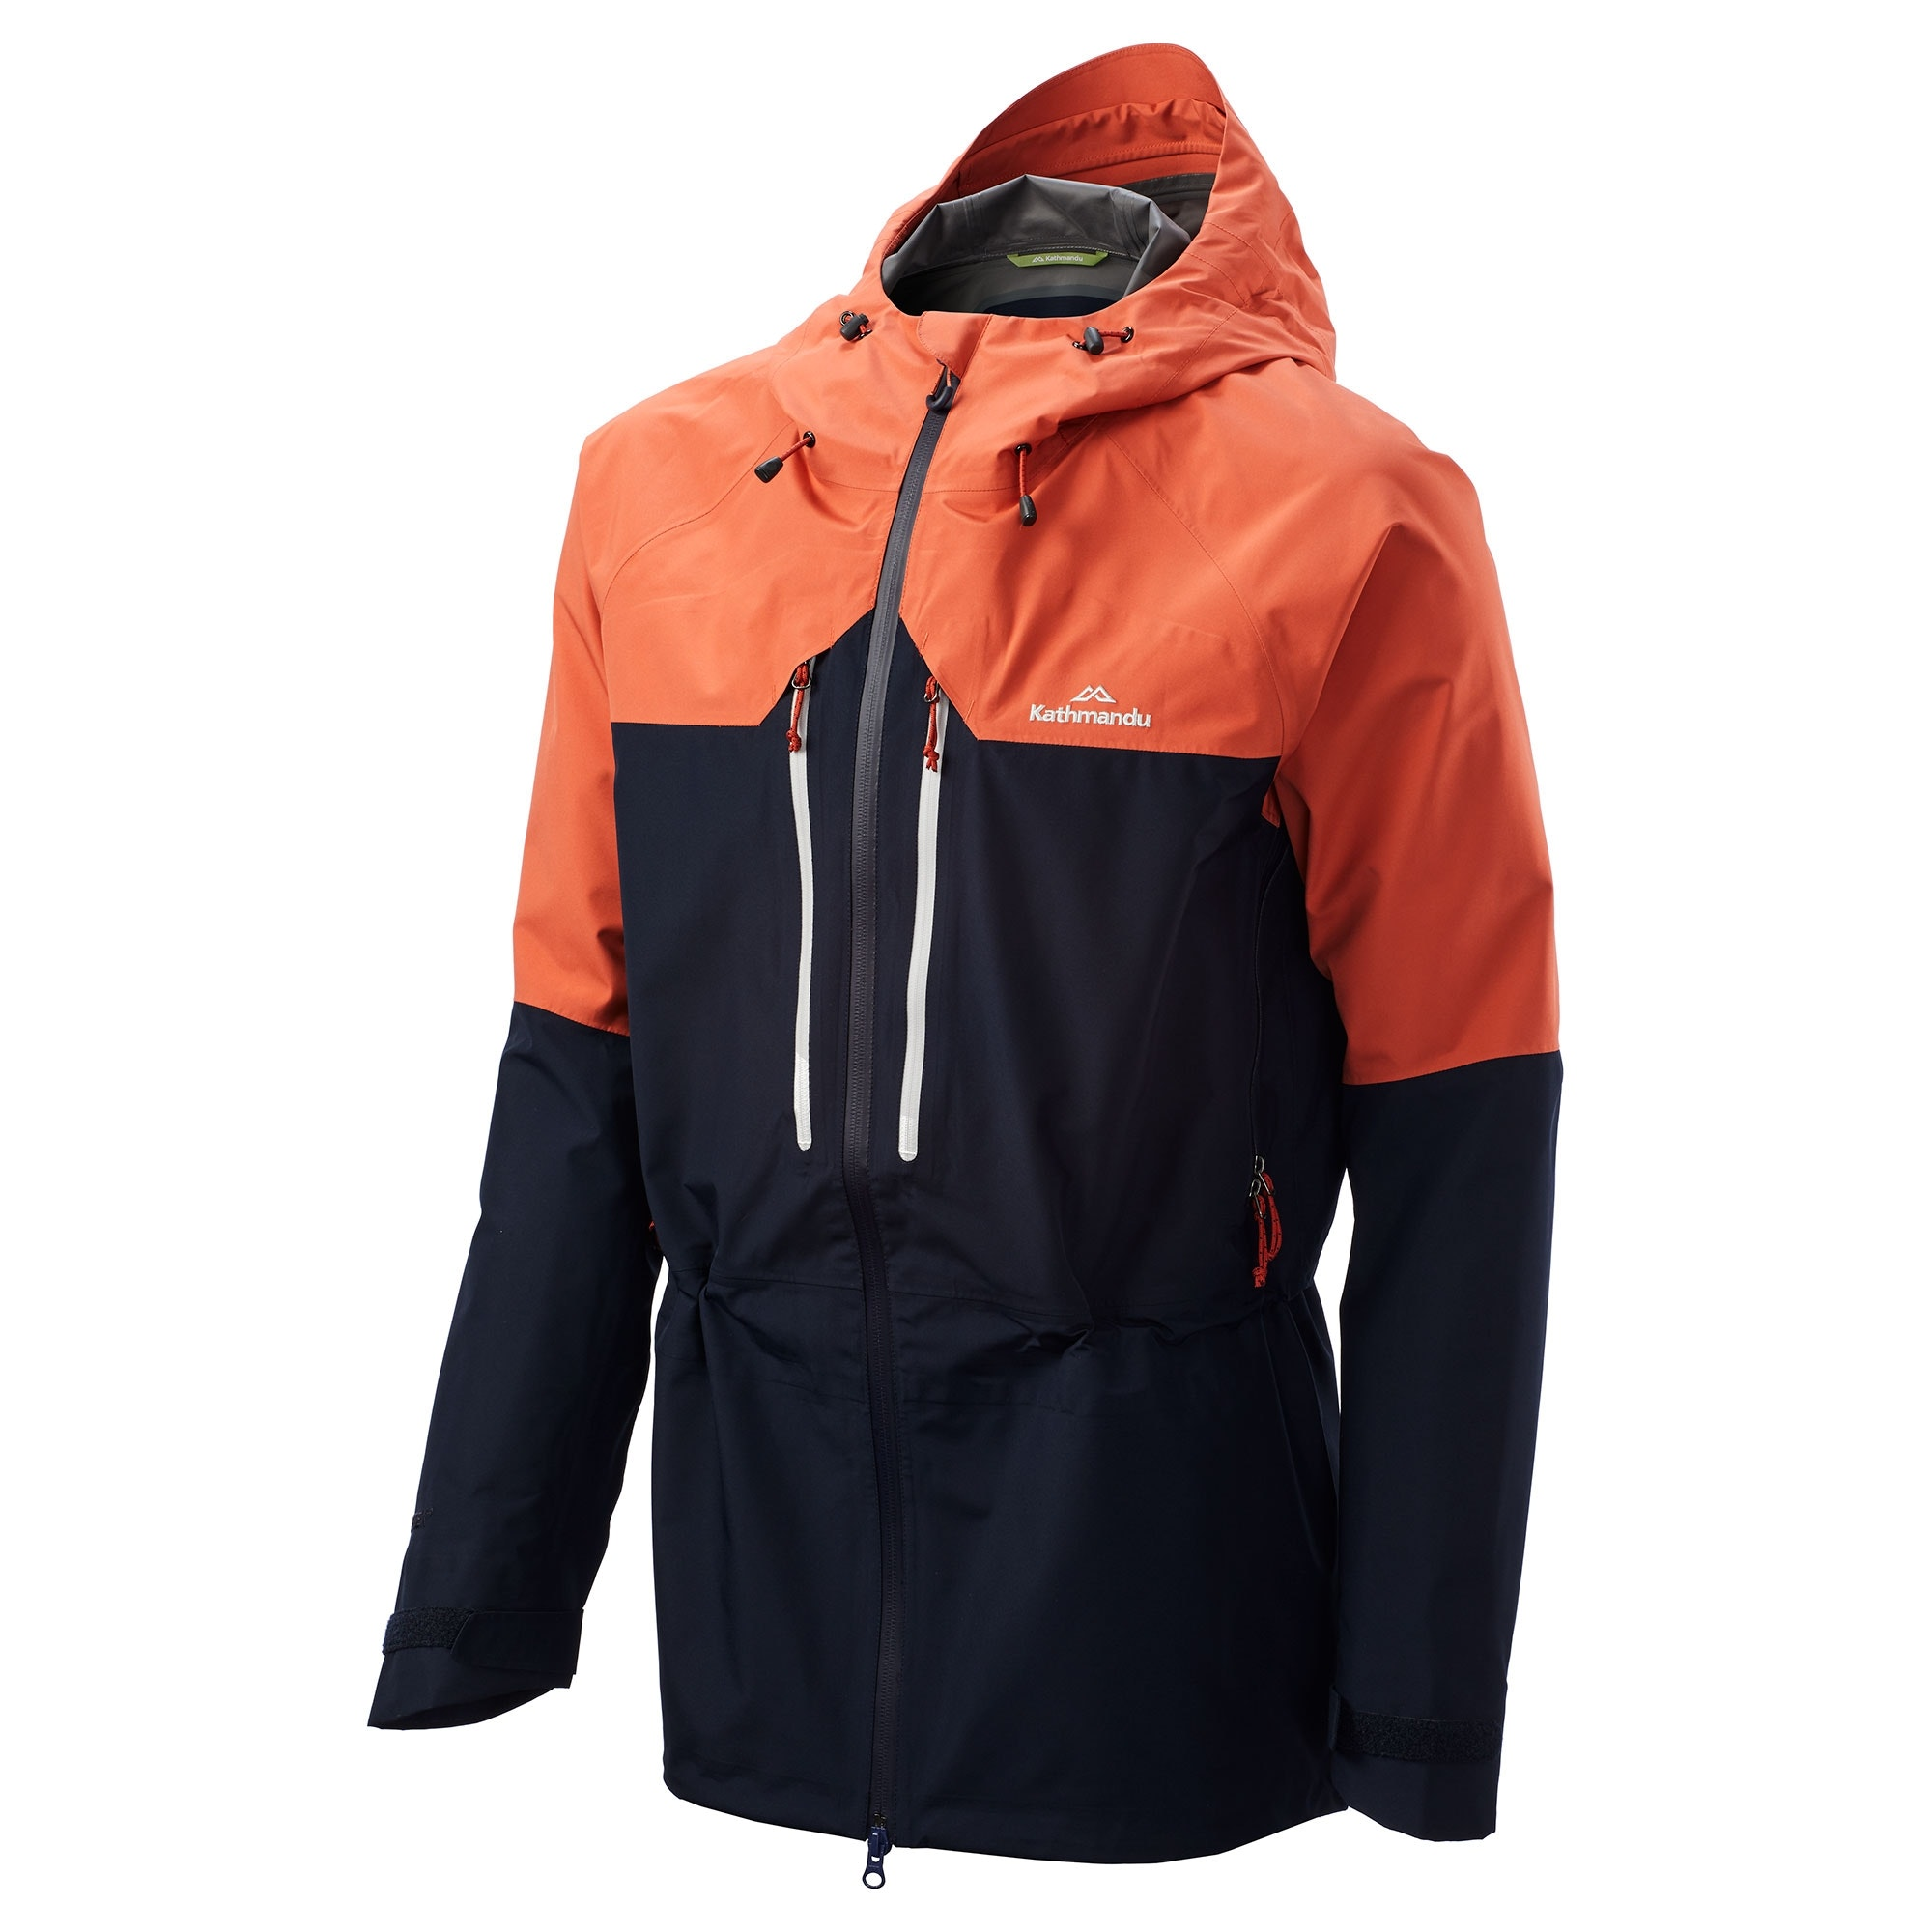 NEW-Kathmandu-Aysen-Men-039-s-GORE-TEX-Windproof-Waterproof-Outdoor-Rain-Jacket thumbnail 13